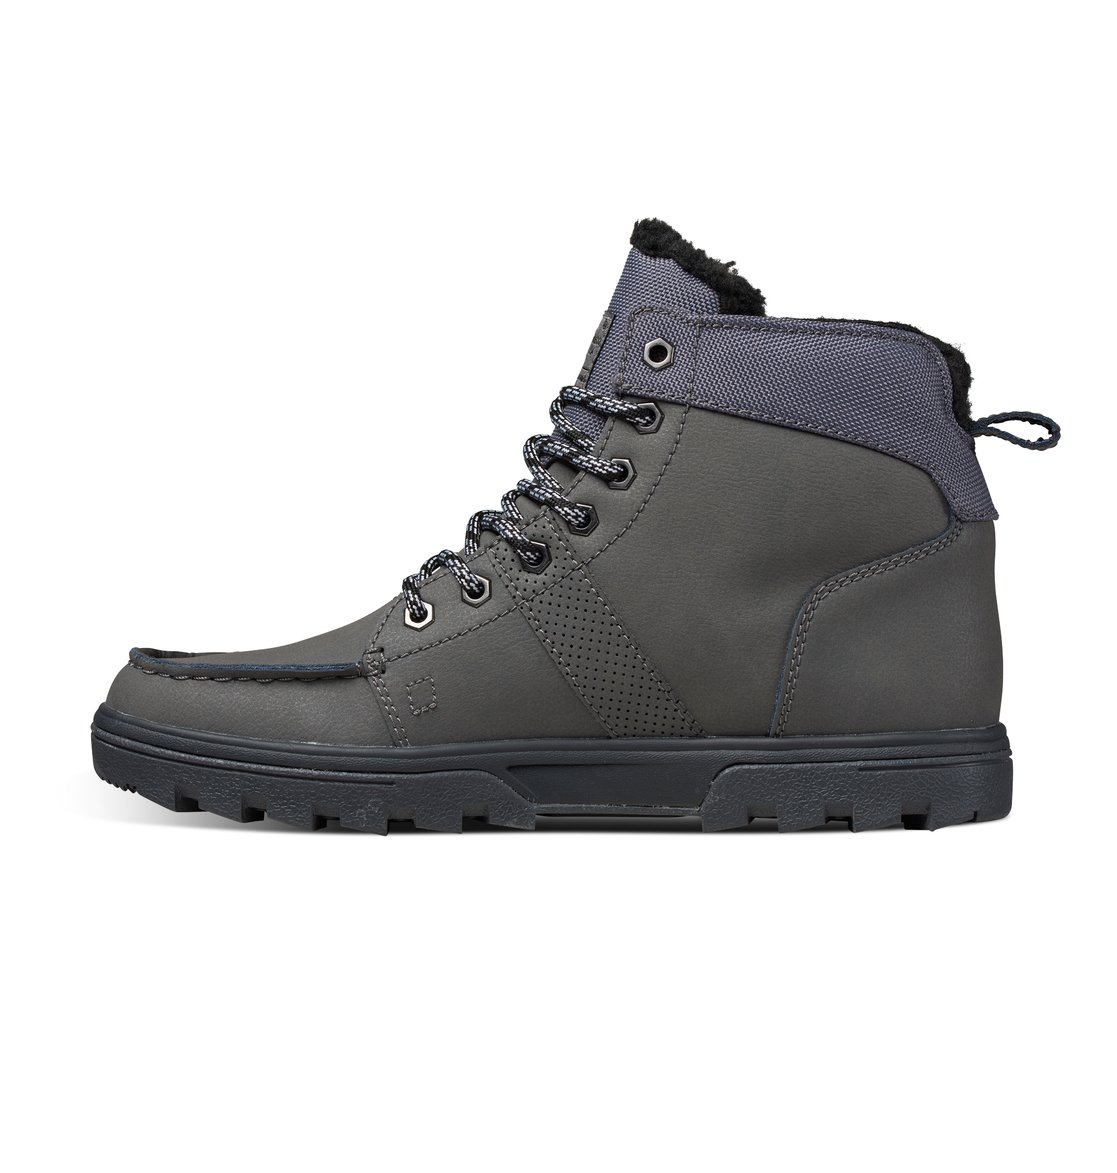 high top dc shoes for men. dc-shoes-men-039-s-high-top-outdoor- high top dc shoes for men |